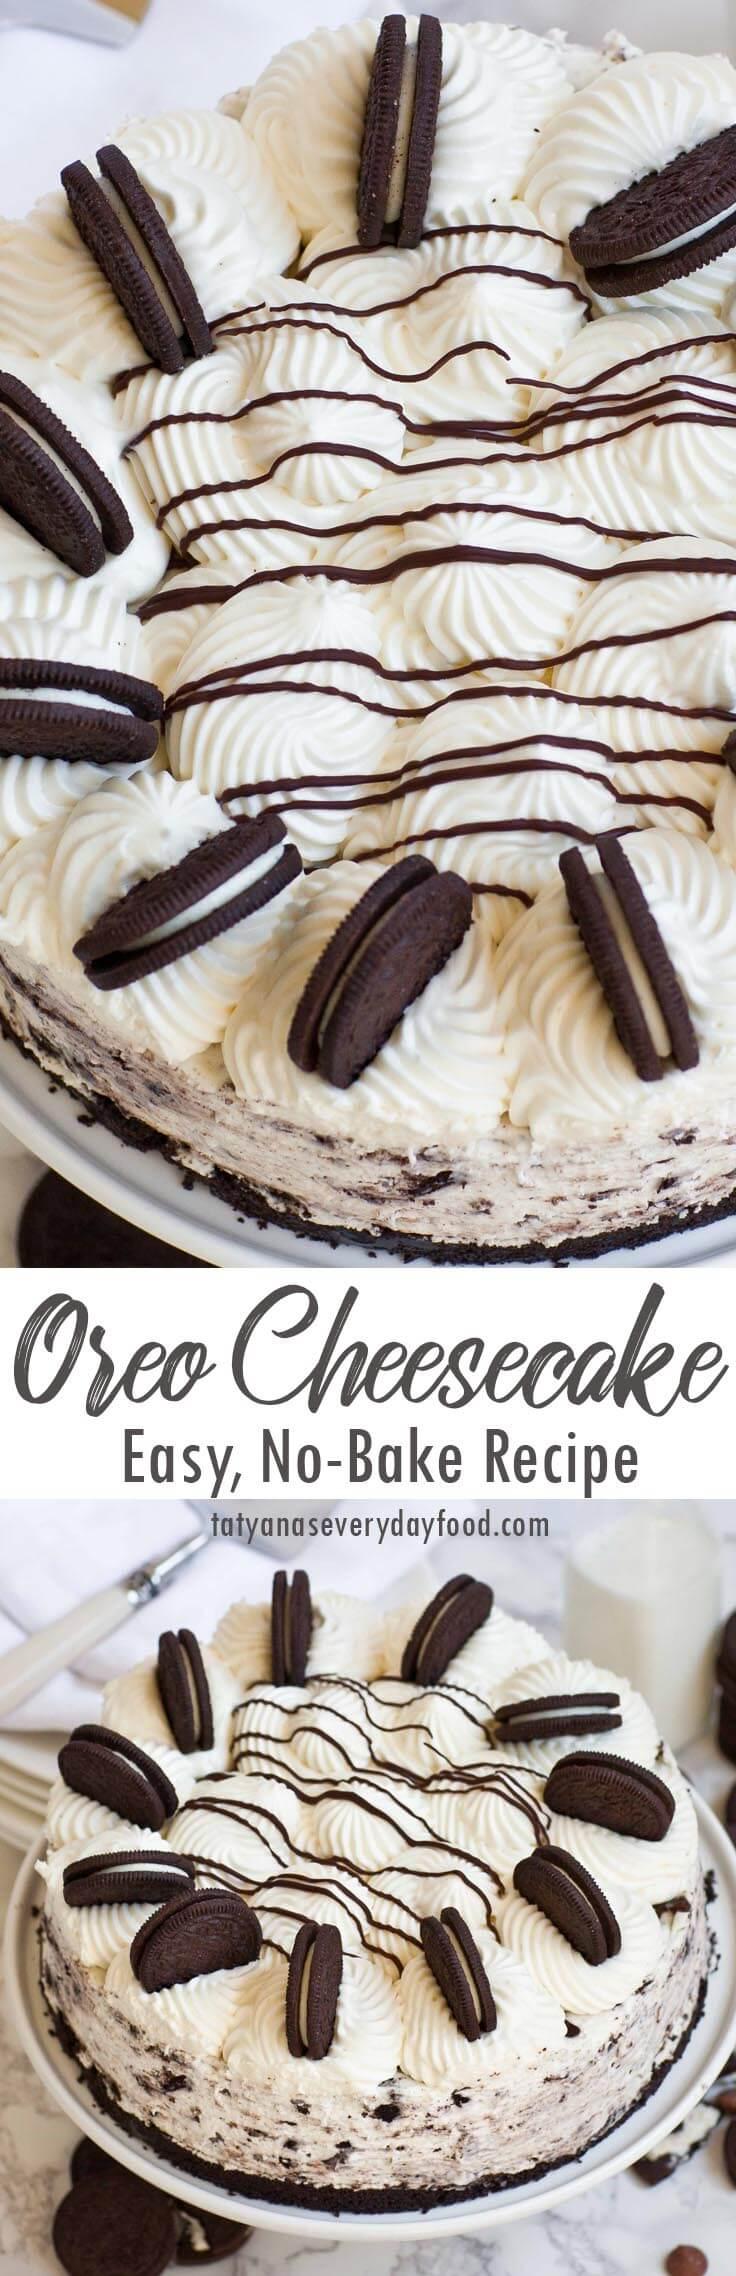 No Bake Oreo Cheesecake video recipe